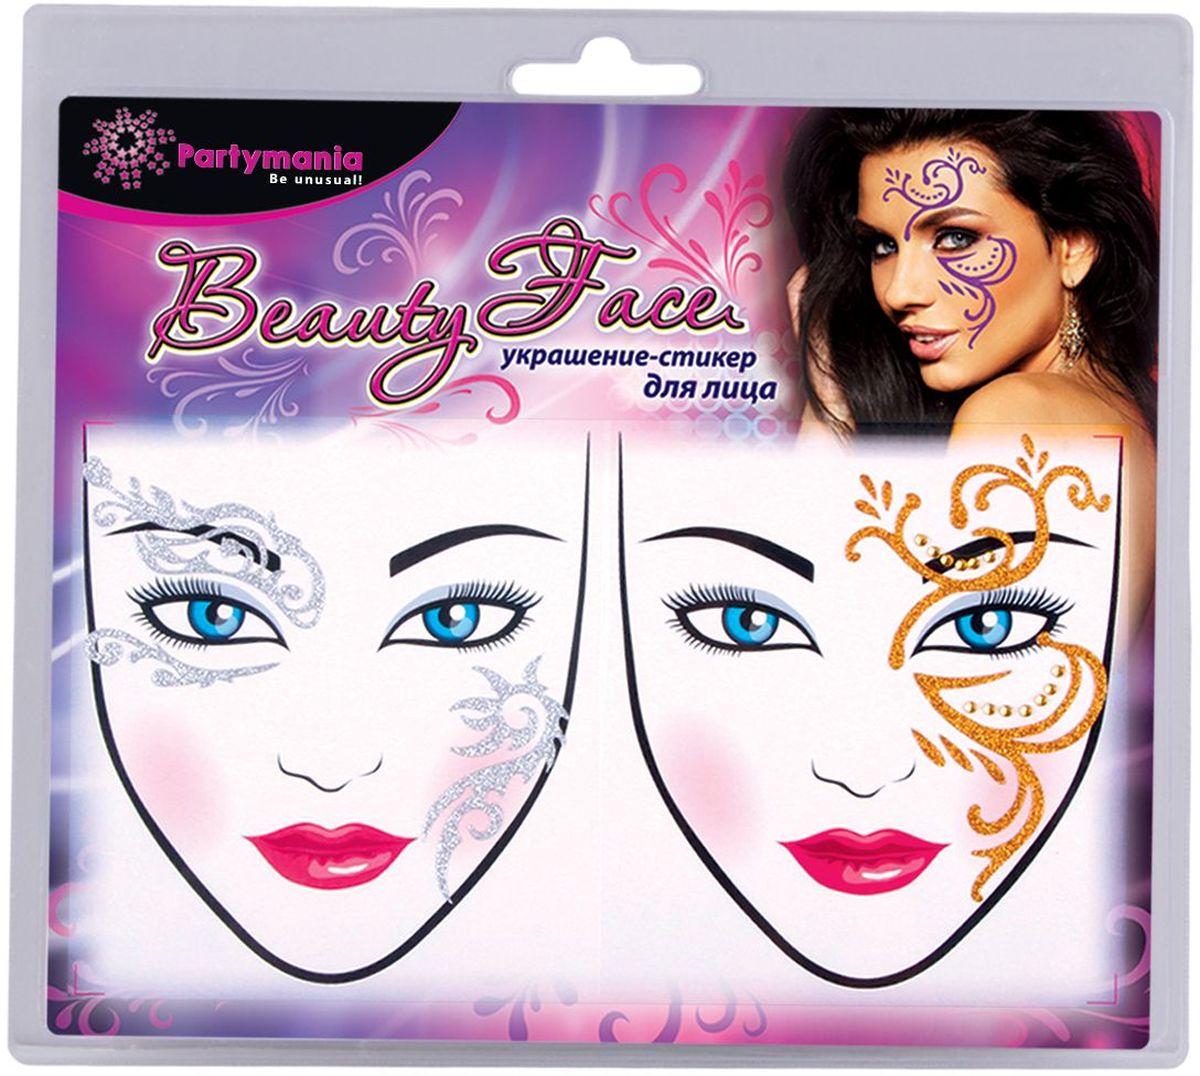 "Partymania Украшение-стикер для лица Beauty Face 2 шт цвет серебристый золотистый, ""Sticker Runner Industrial Ltd."""